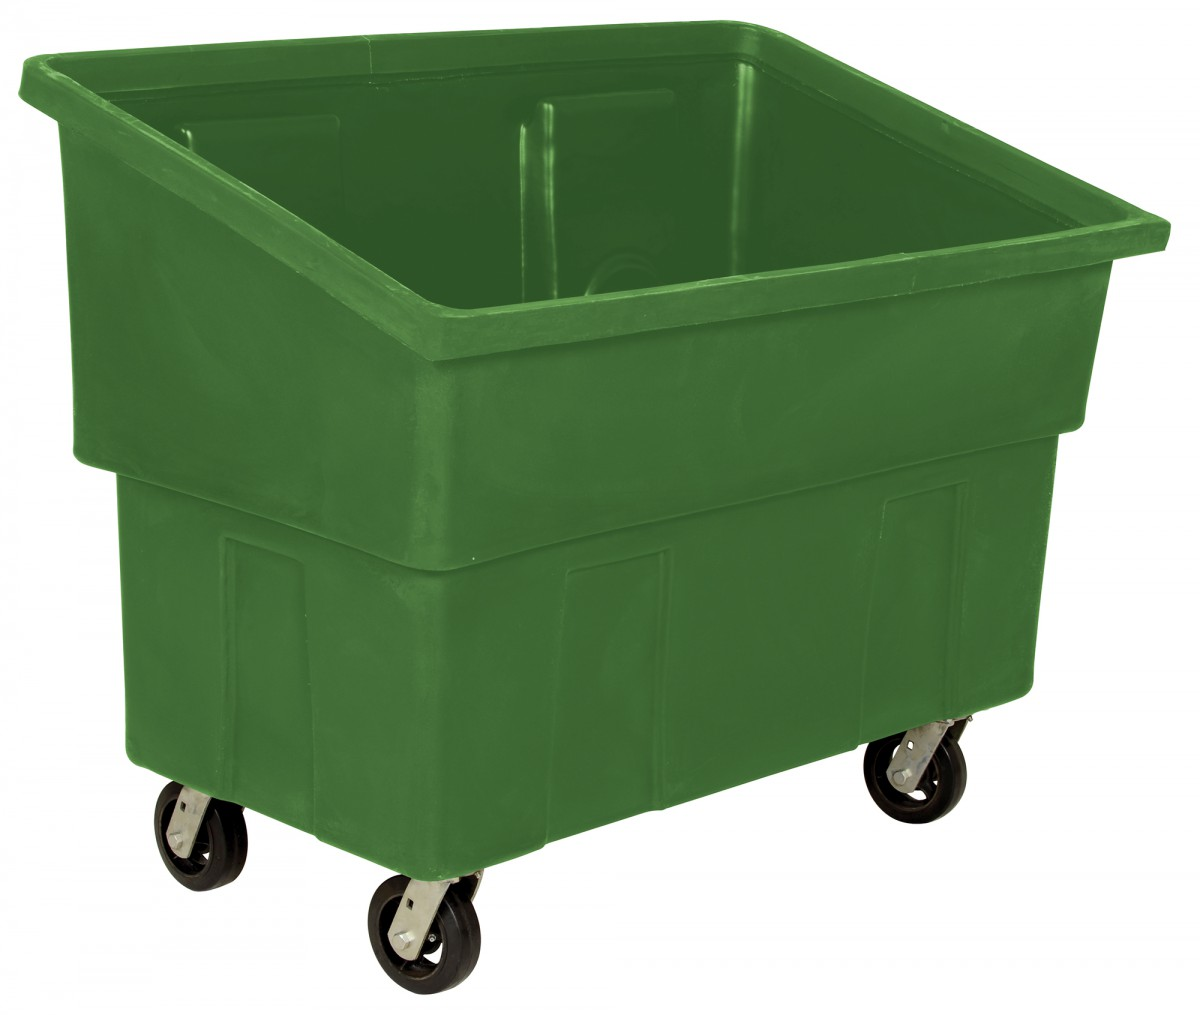 Ergonomic Waste Handling Carts Ergonomic Trash Carts